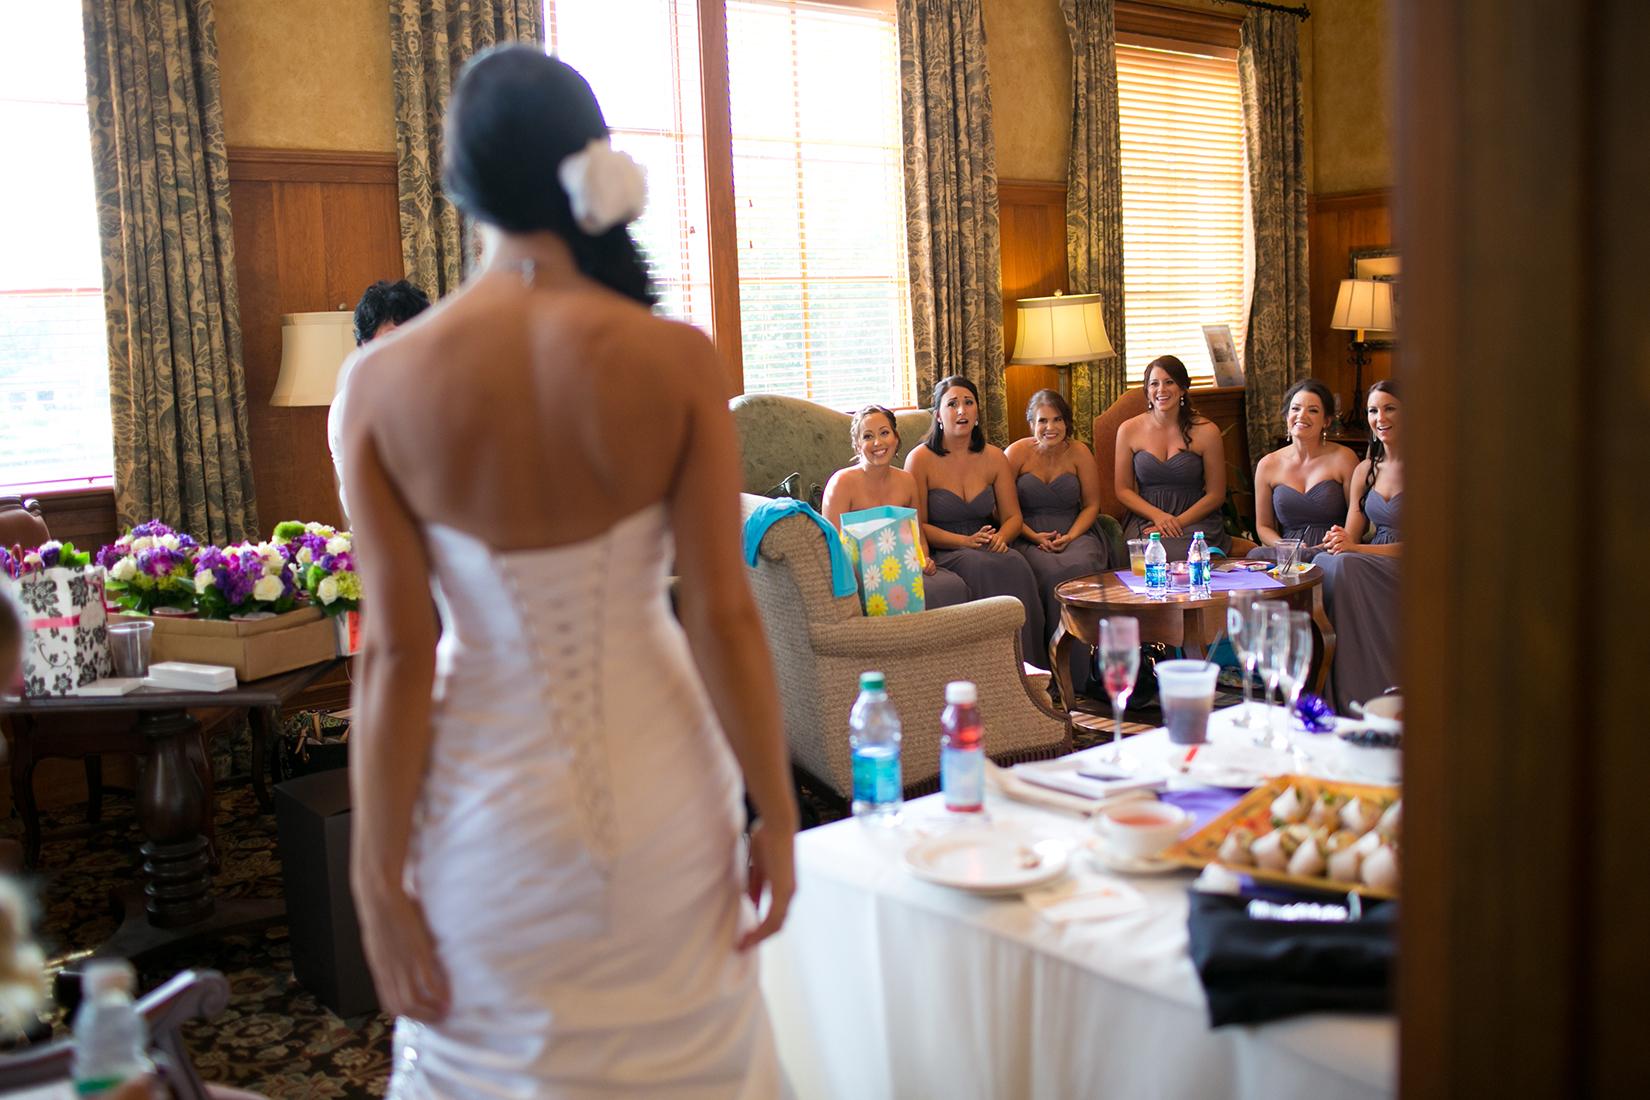 adam-szarmack-tpc-sawgrass-ponte-vedra-wedding-photographer-PZ3A9485.jpg